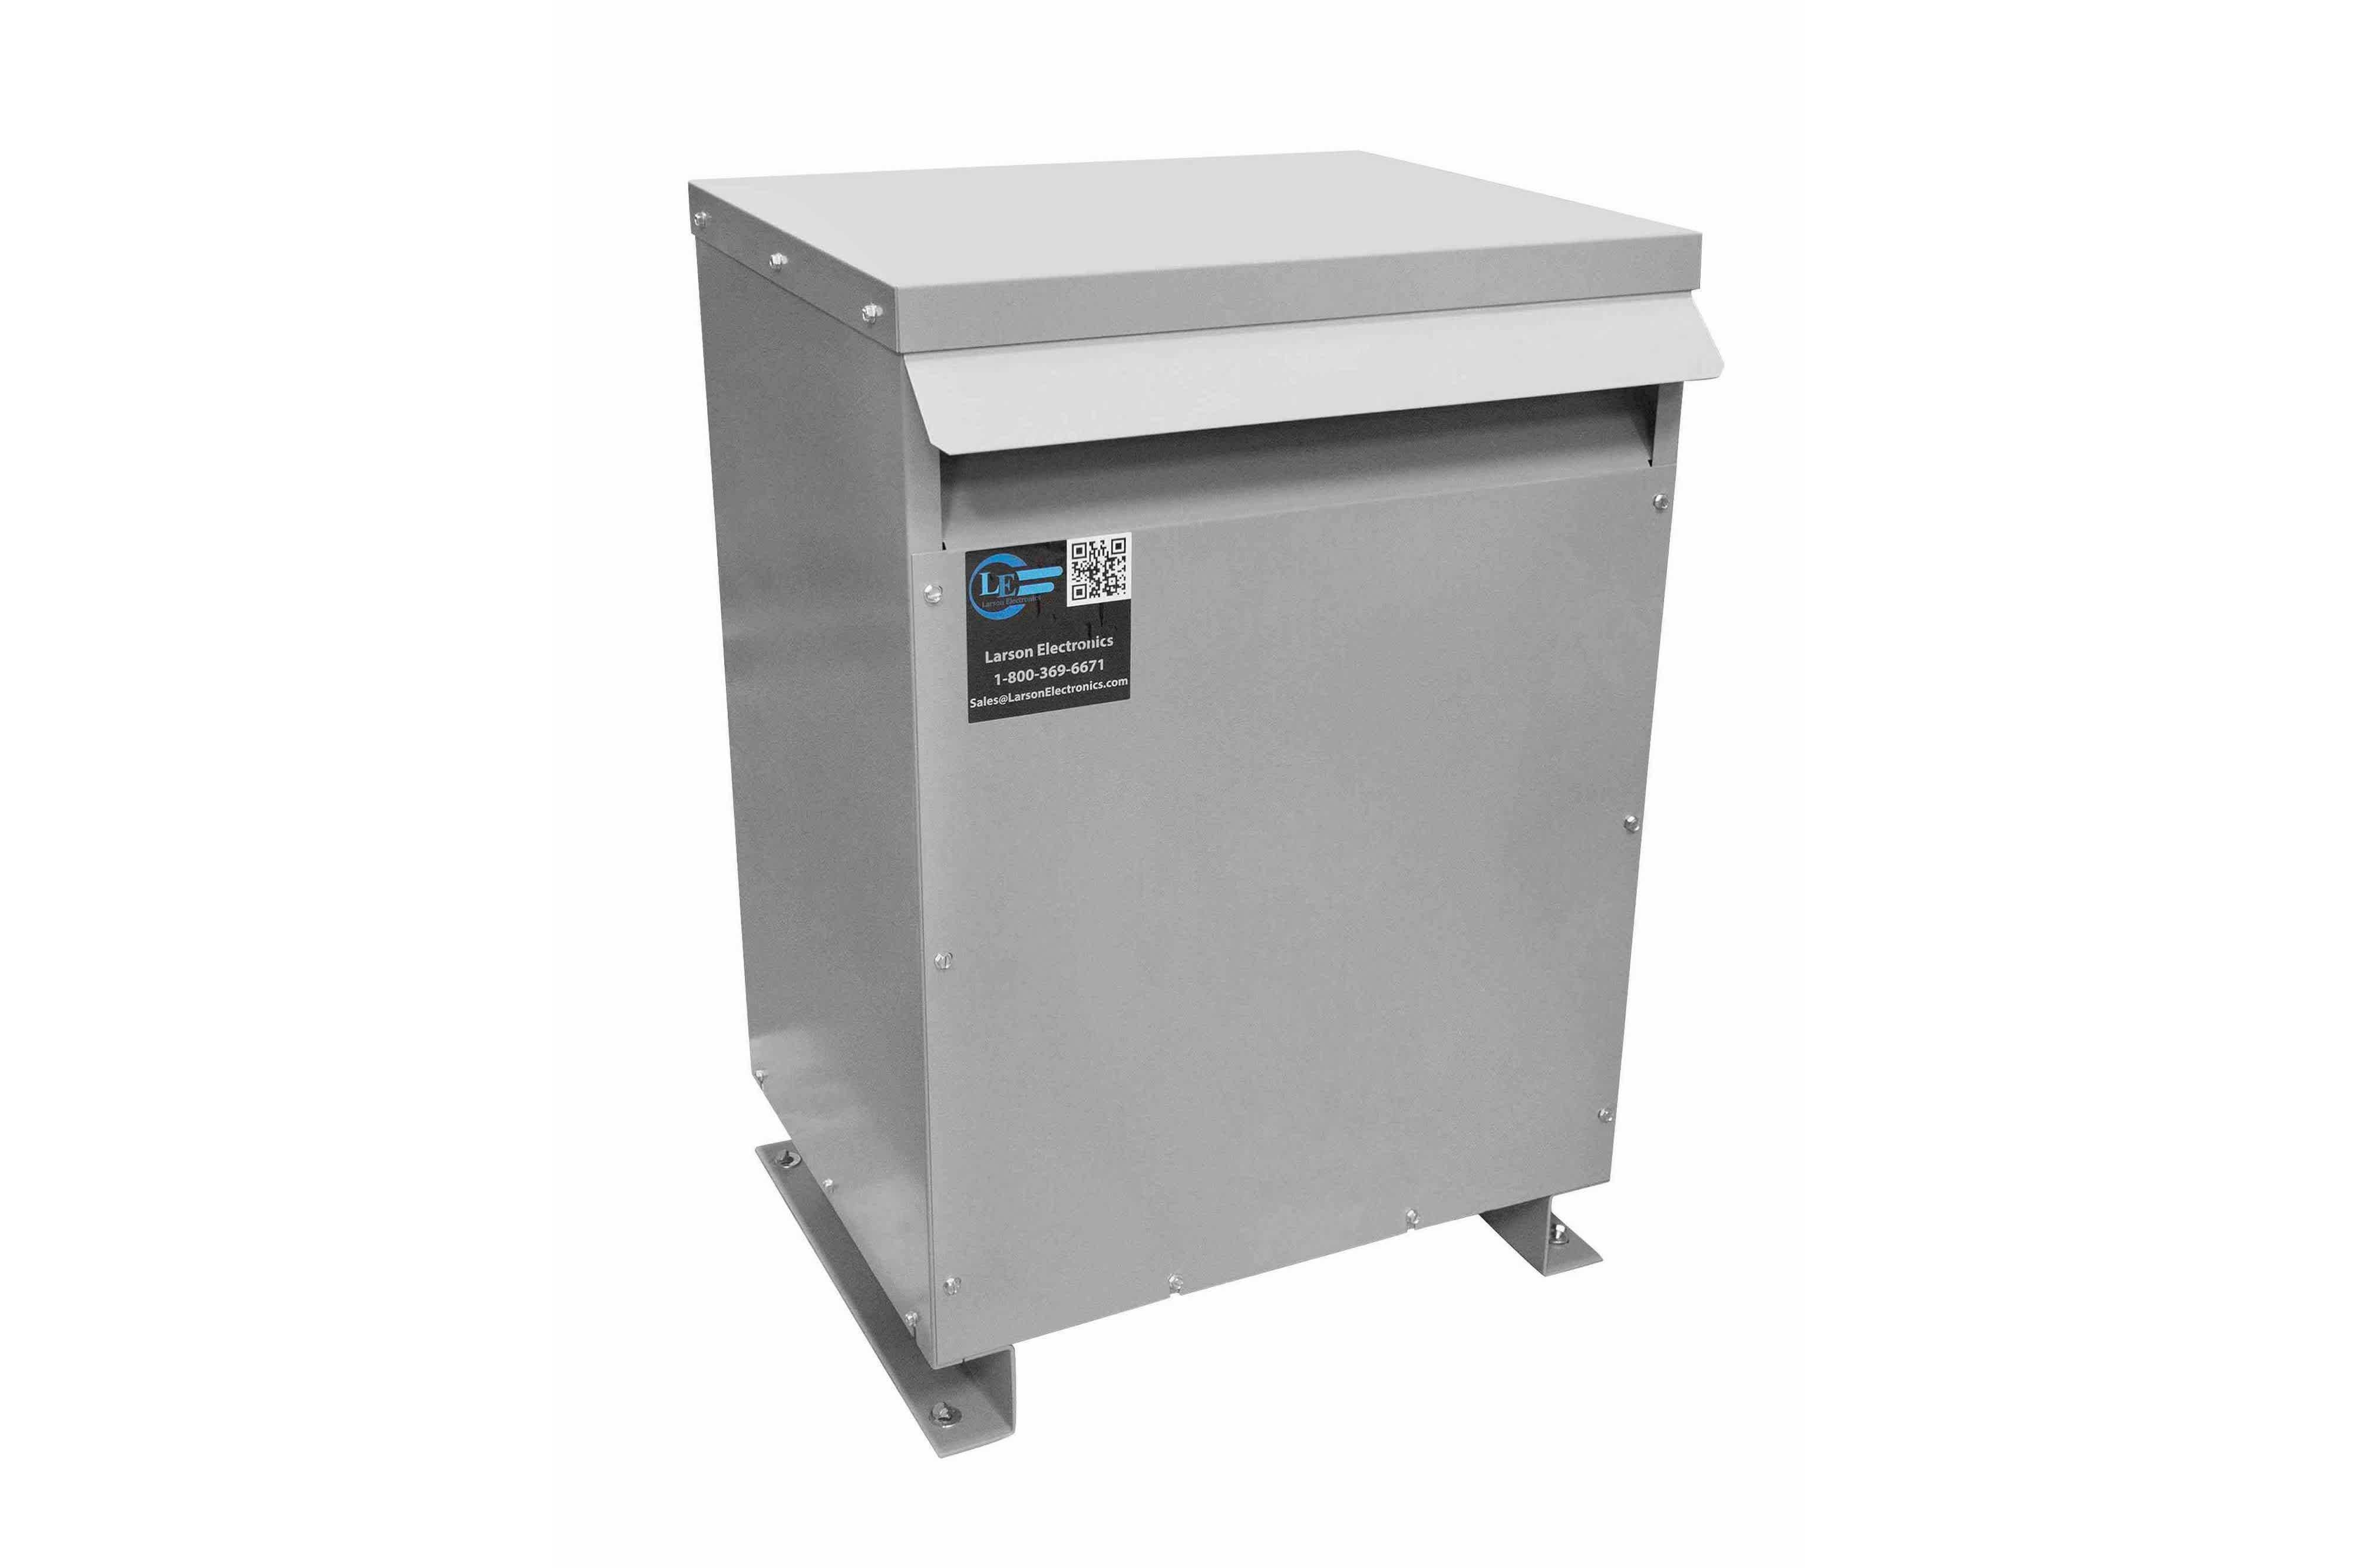 80 kVA 3PH DOE Transformer, 240V Delta Primary, 380Y/220 Wye-N Secondary, N3R, Ventilated, 60 Hz